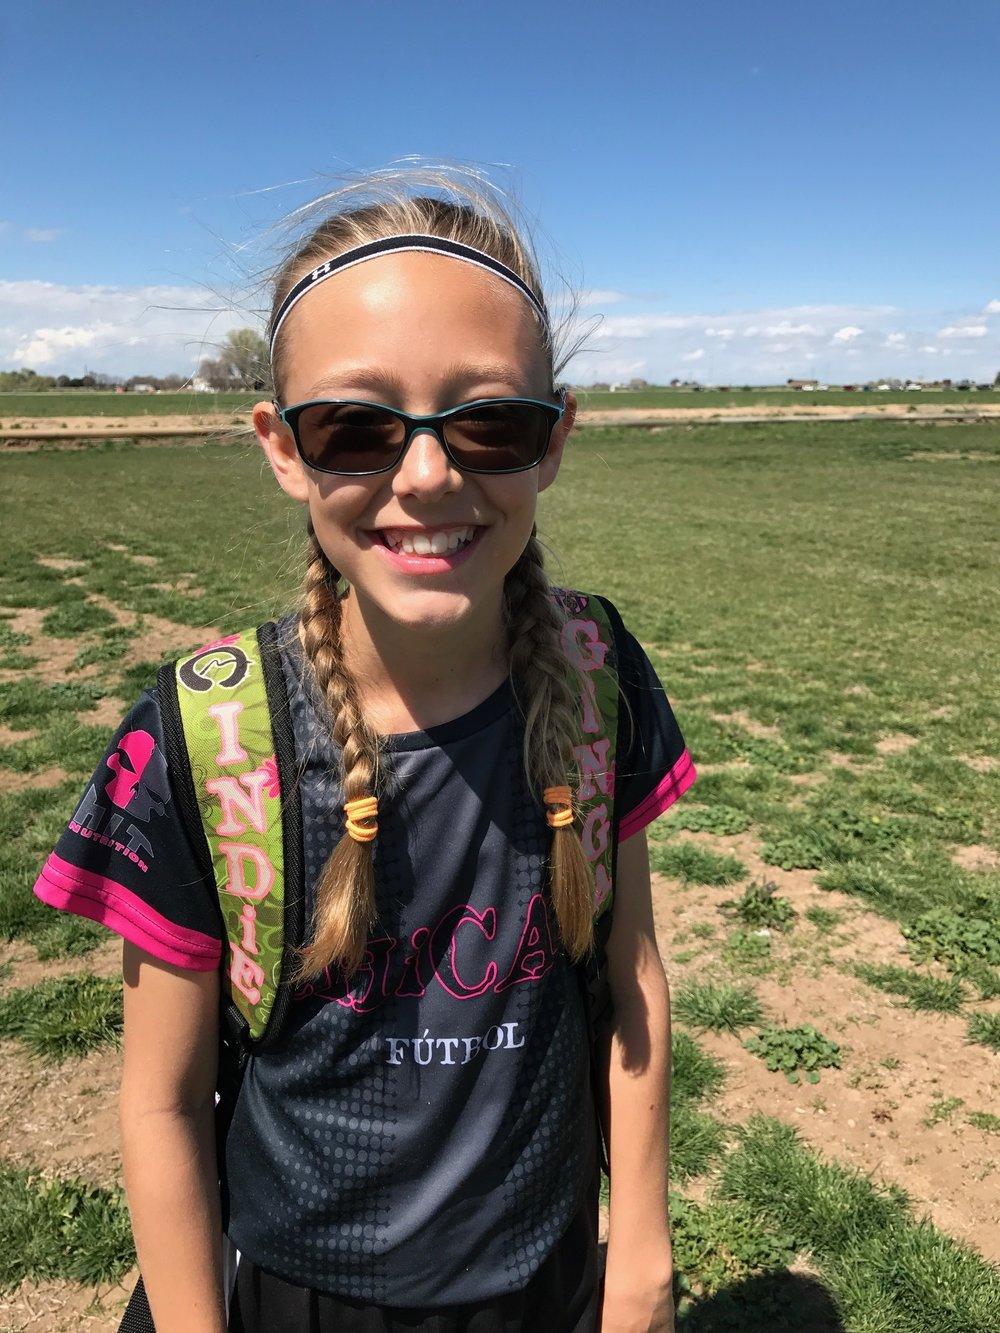 Erin Knoll, U12 Chicas